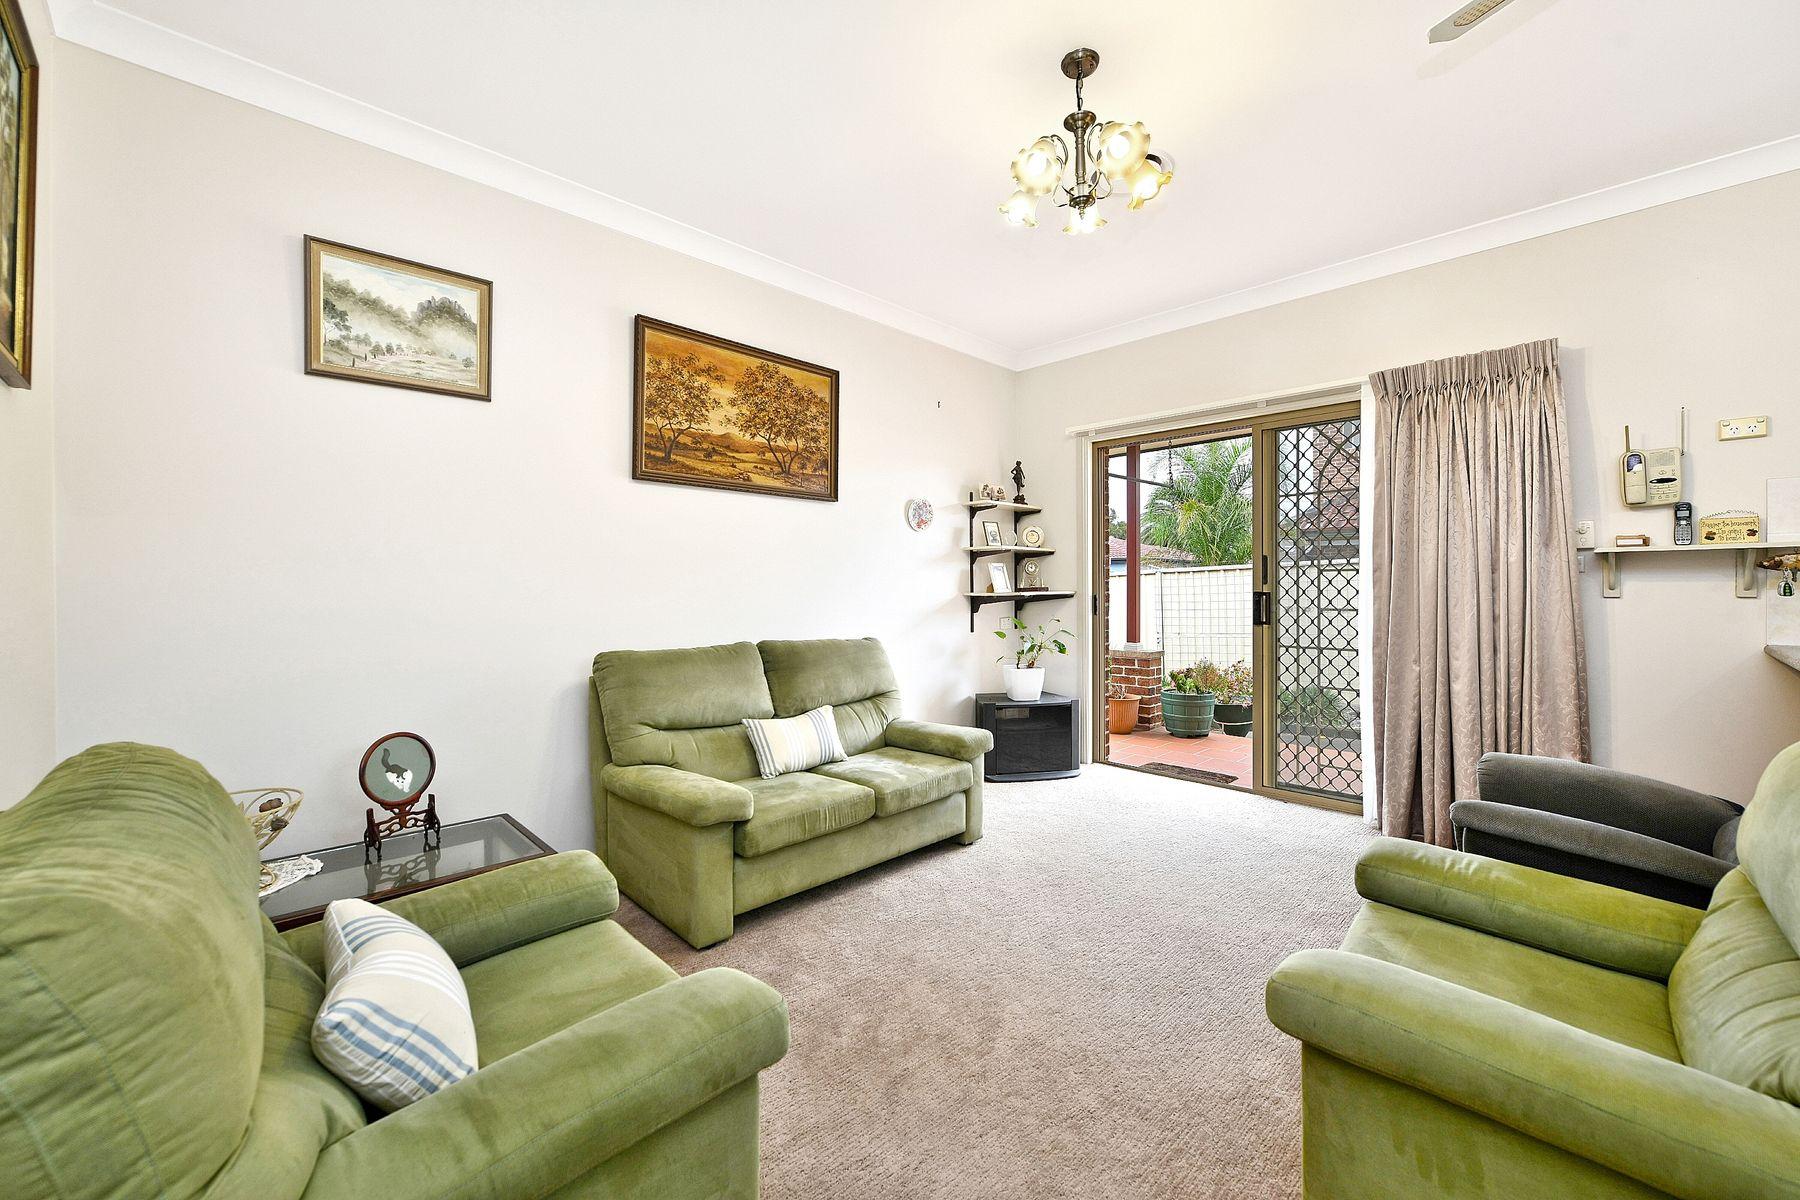 2/1A Proctor pde, Sefton, NSW 2162